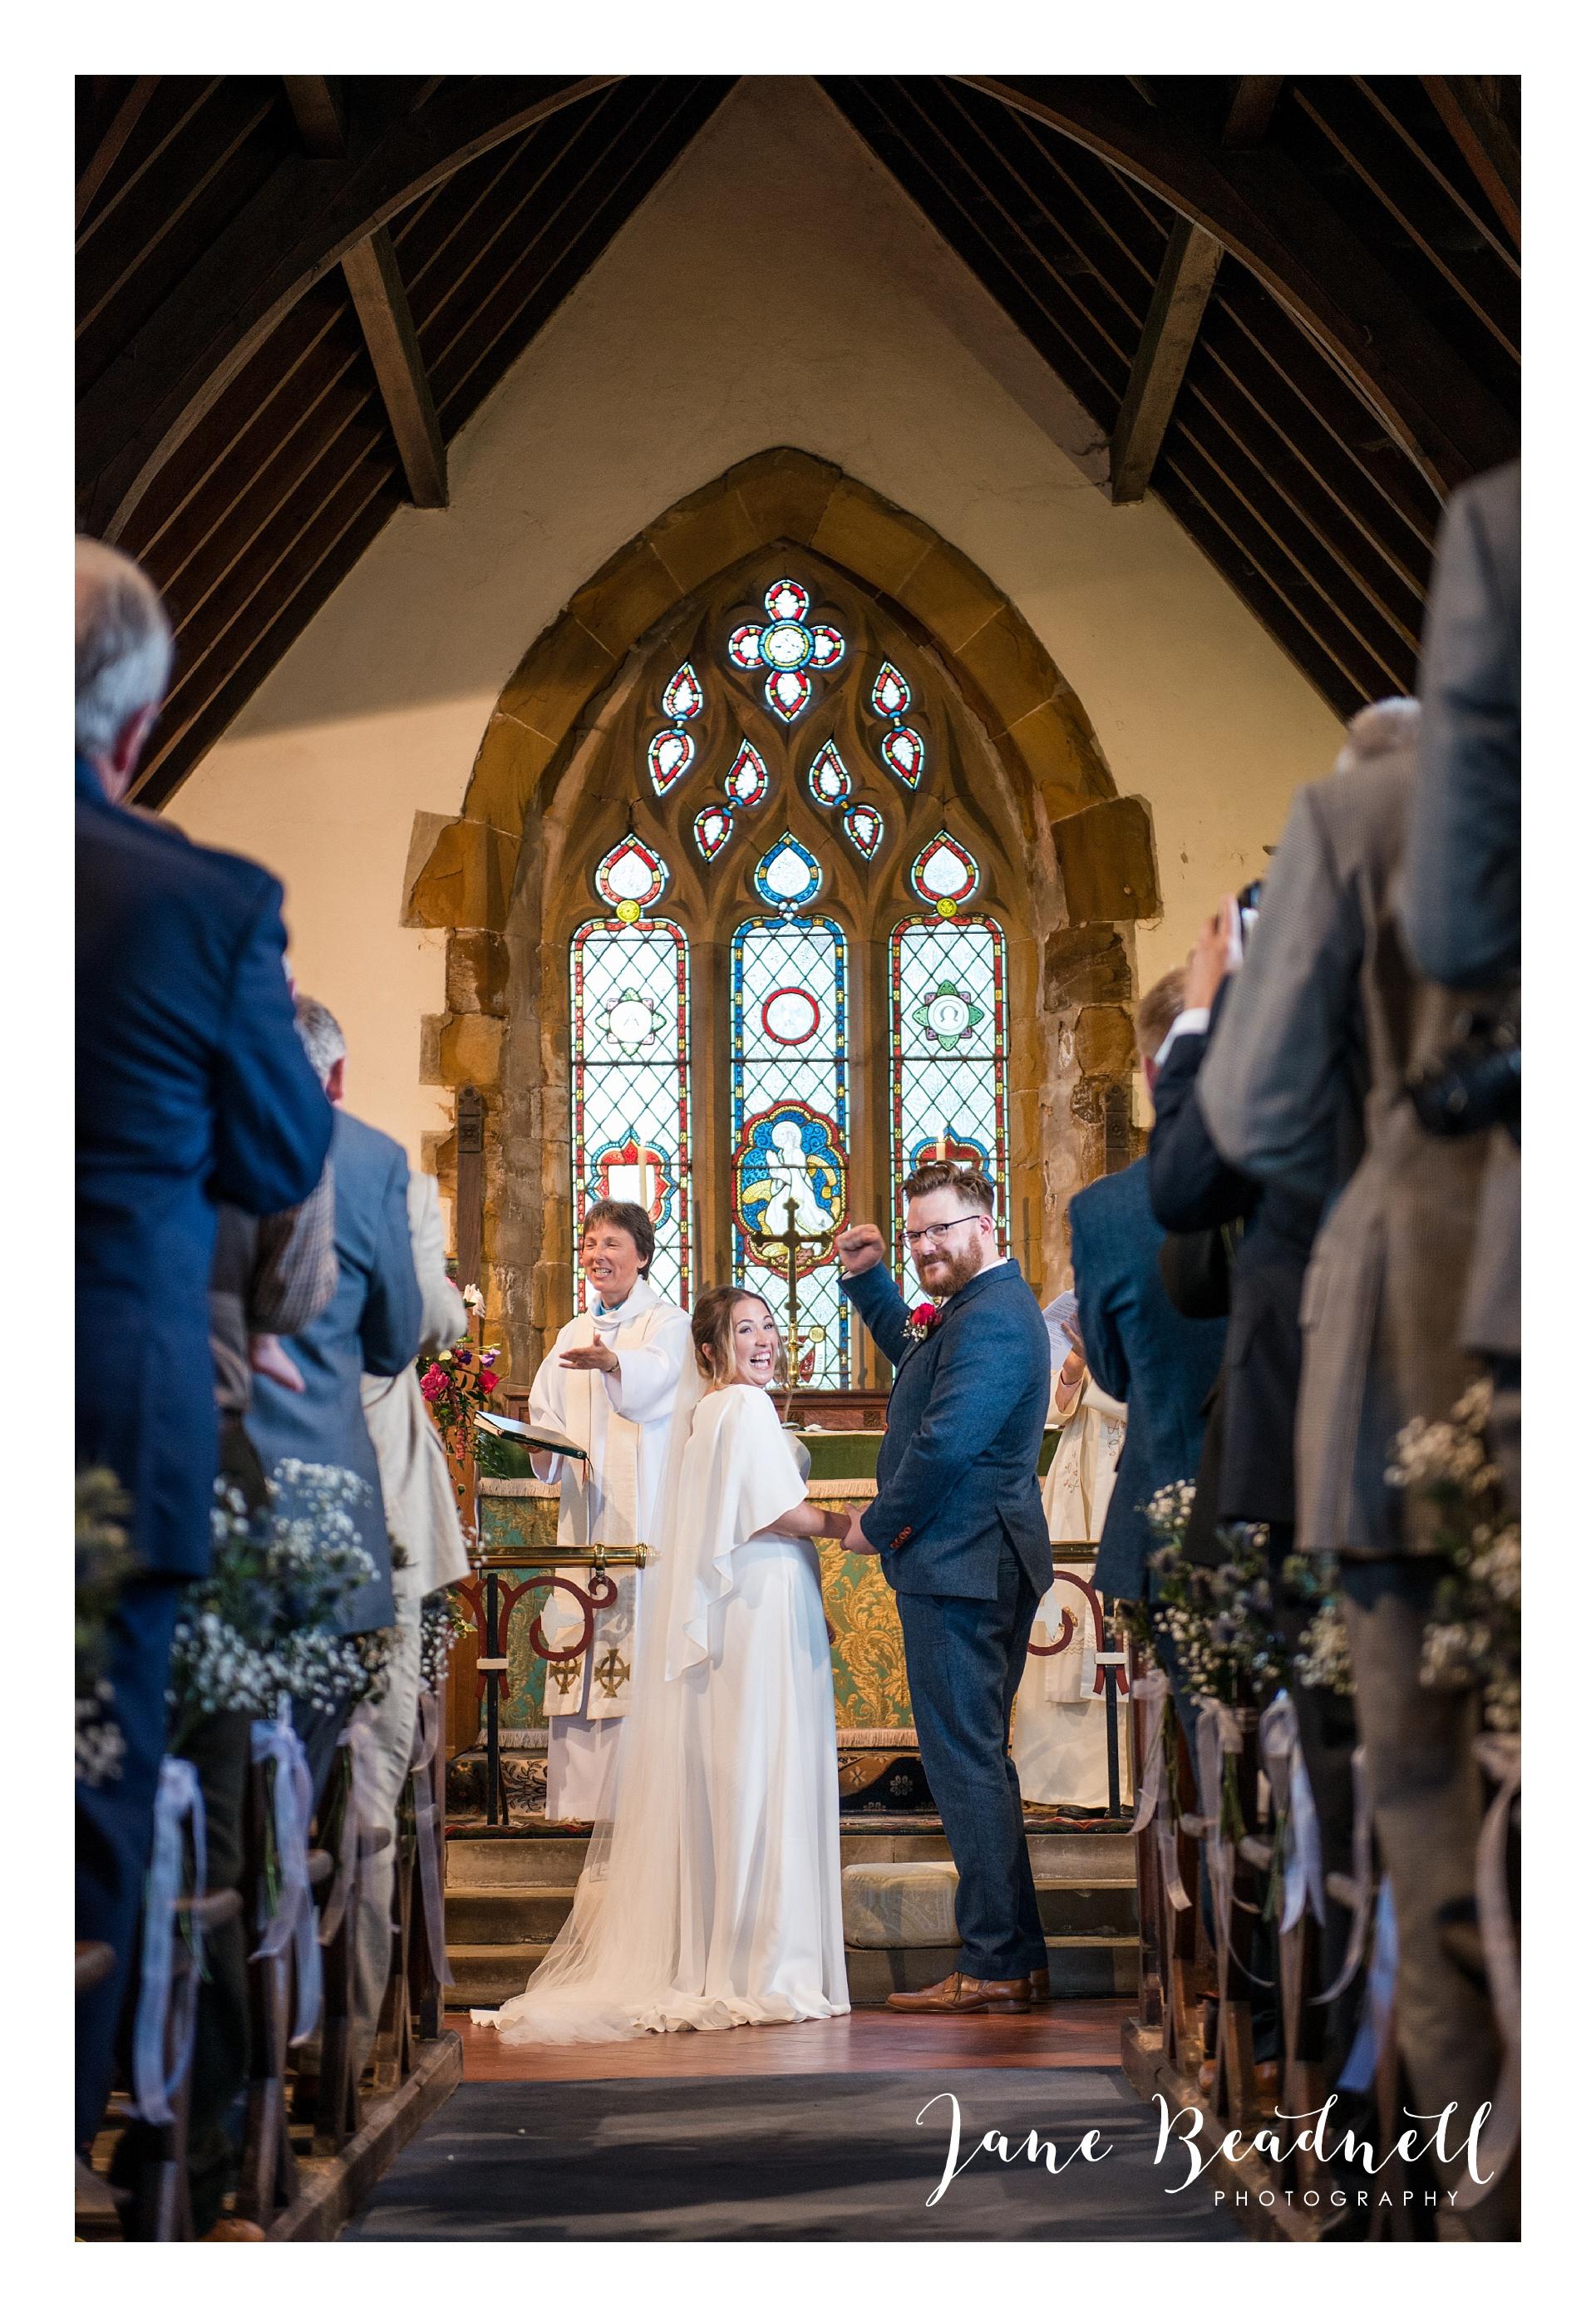 fine-art-wedding-photographer-jane-beadnell-yorkshire-wedding-photographer_0051